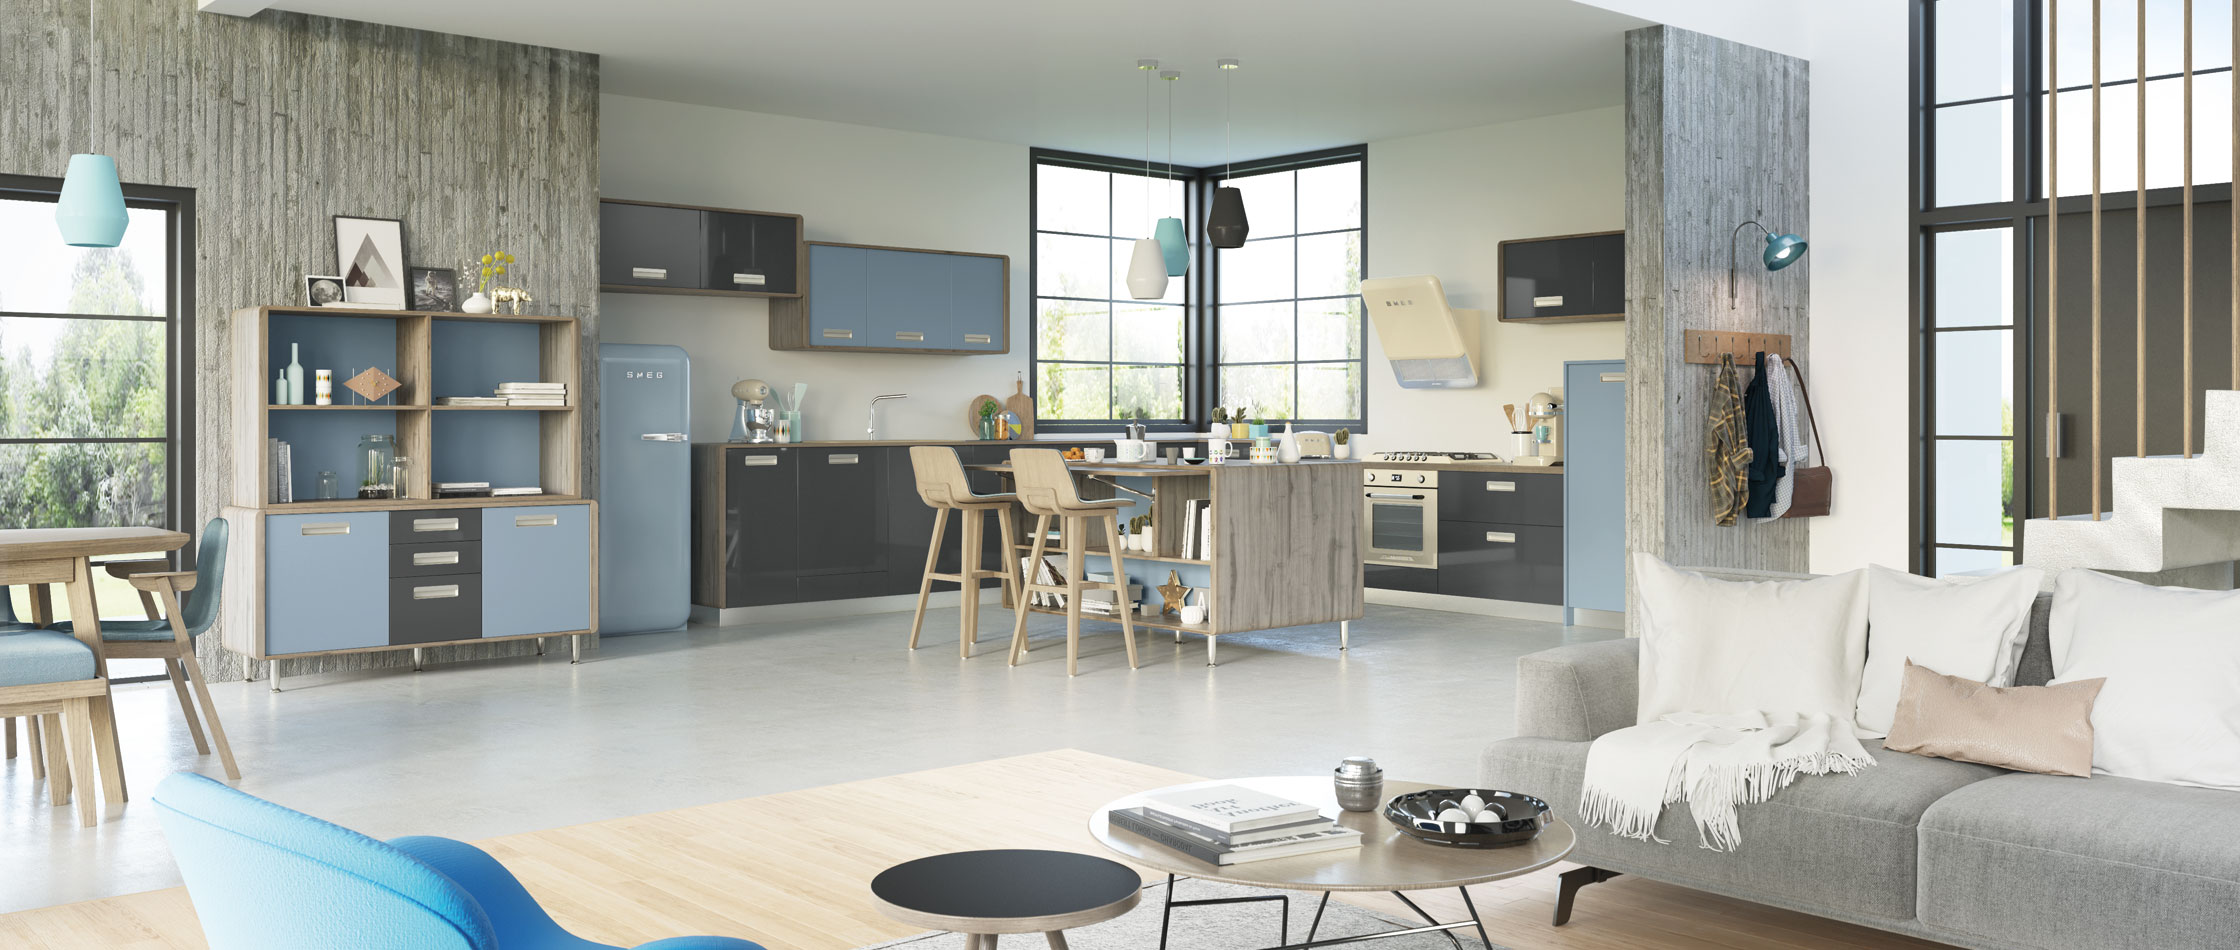 nos cuisines design moderne bois avec lot comera cuisines. Black Bedroom Furniture Sets. Home Design Ideas